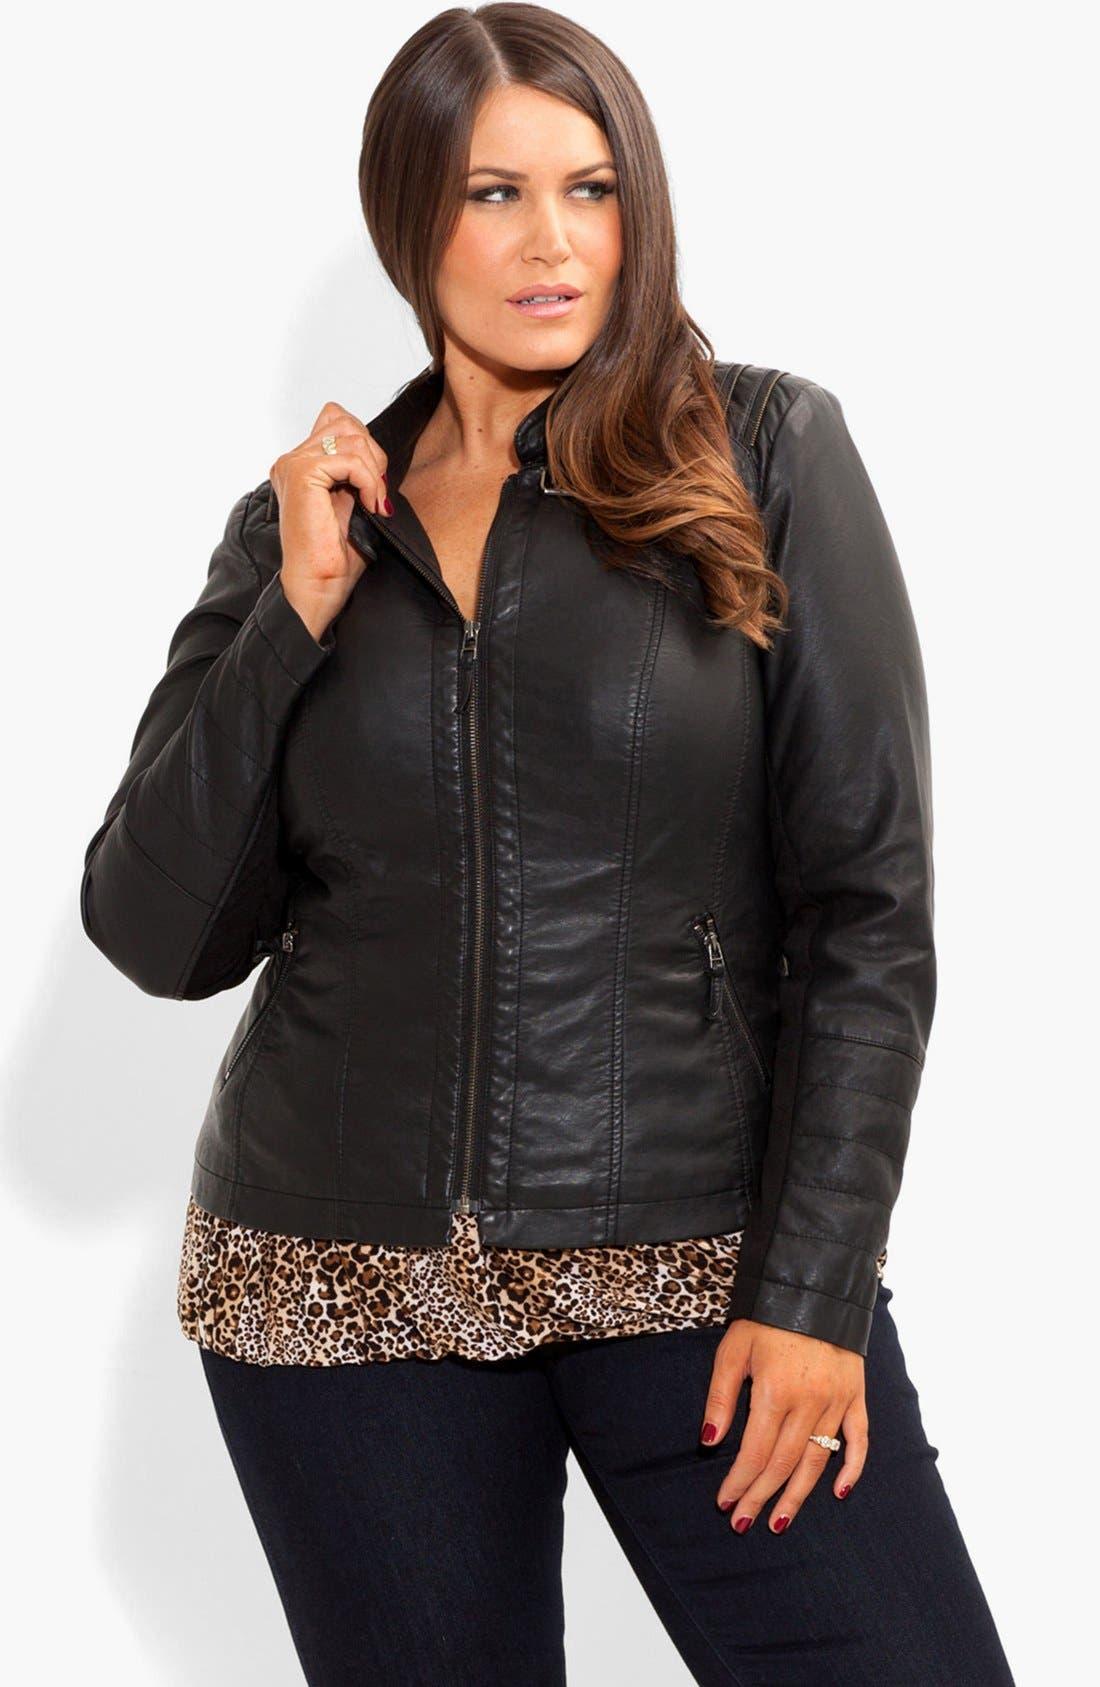 Alternate Image 1 Selected - City Chic Faux Leather Biker Jacket (Plus Size)